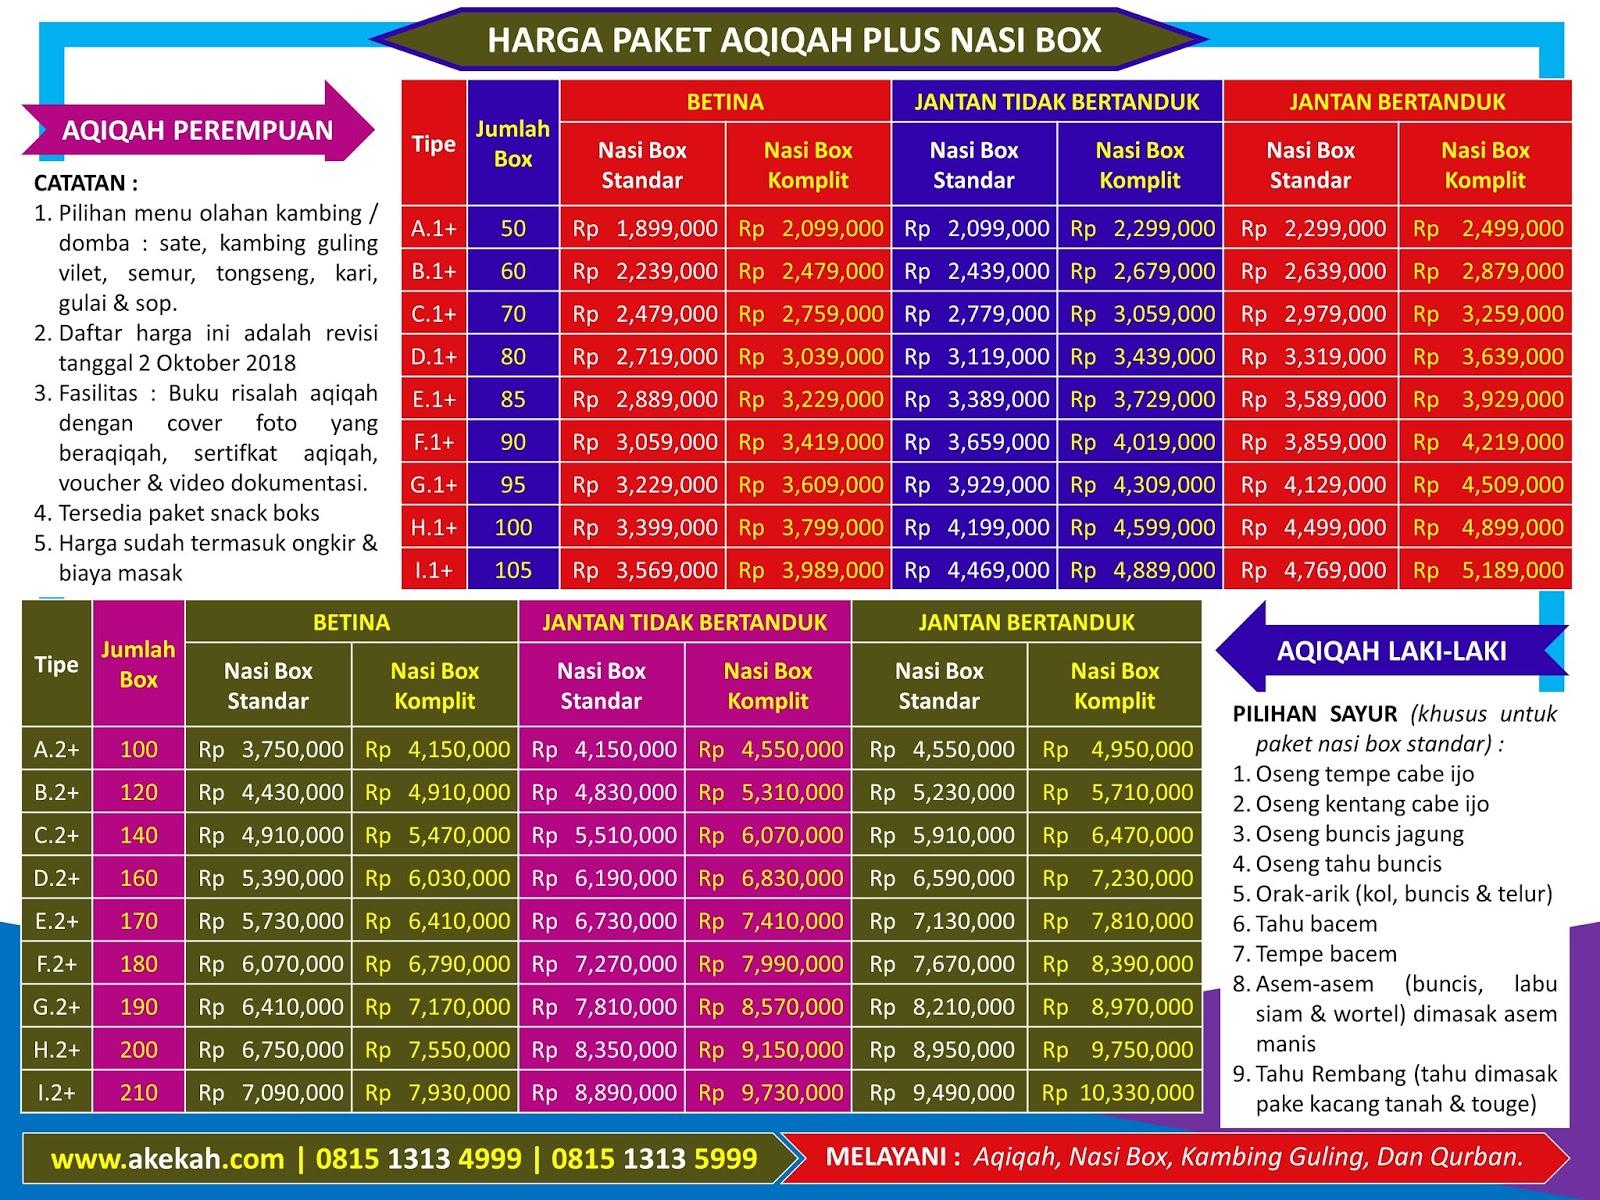 Penyedia Jasa Akikah & Catering Murah Untuk Laki-Laki Daerah Ciawi Kabupaten Bogor Jawa Barat